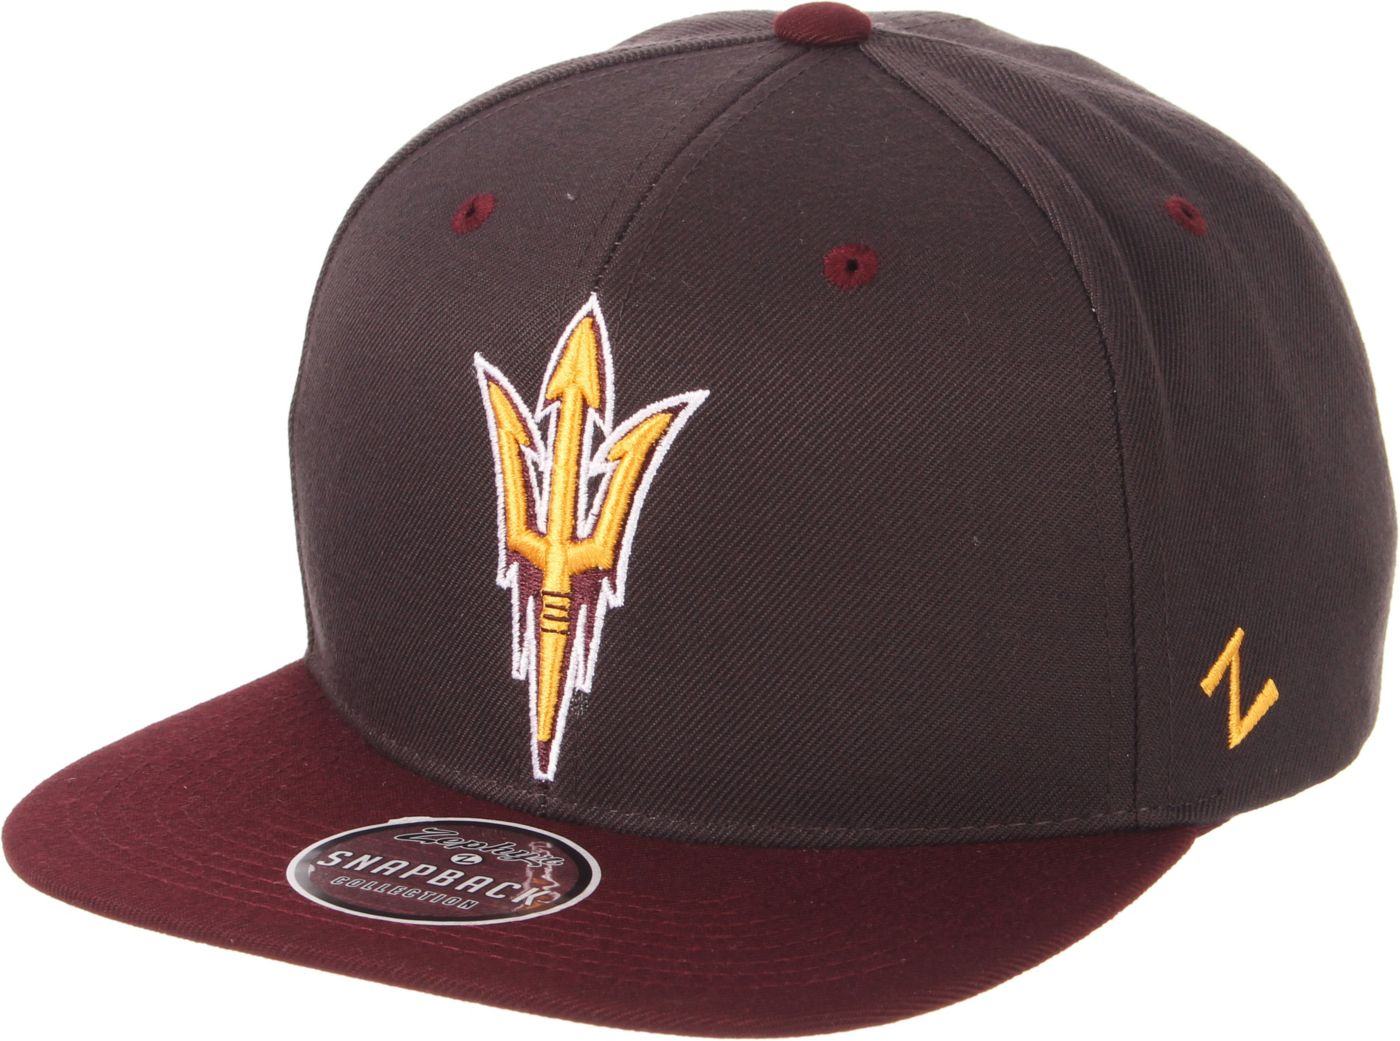 Zephyr Men's Arizona State Sun Devils Grey/Maroon Script Adjustable Snapback Hat